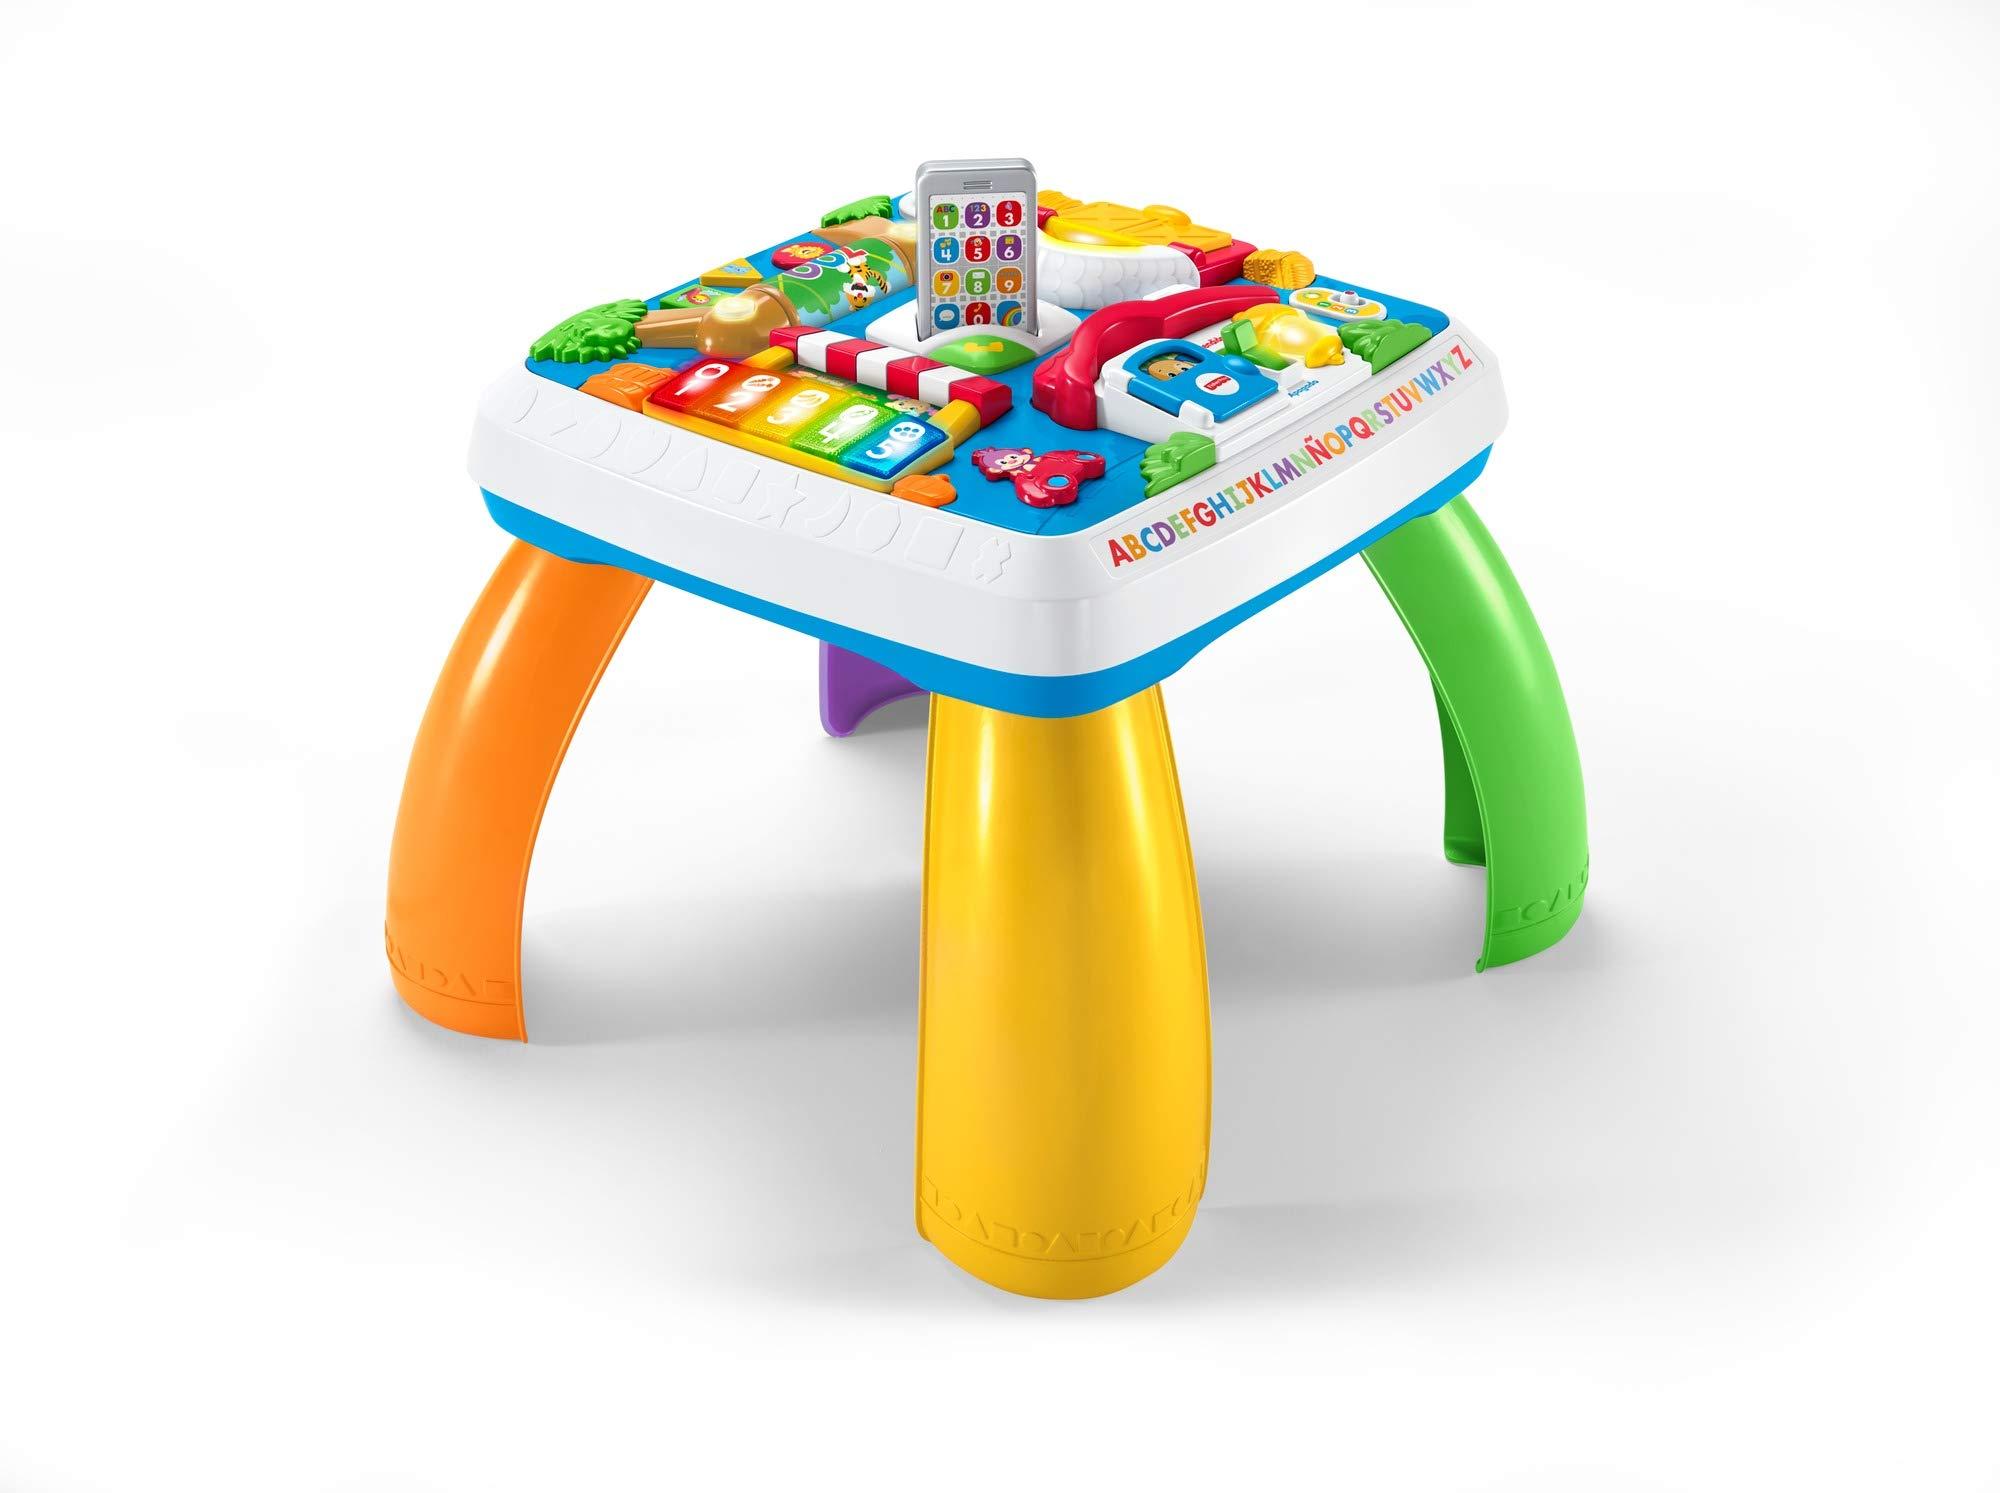 Fisher-Price – Mesa multiaprendizaje bilingüe -juguetes educativos – (Mattel DRH34)